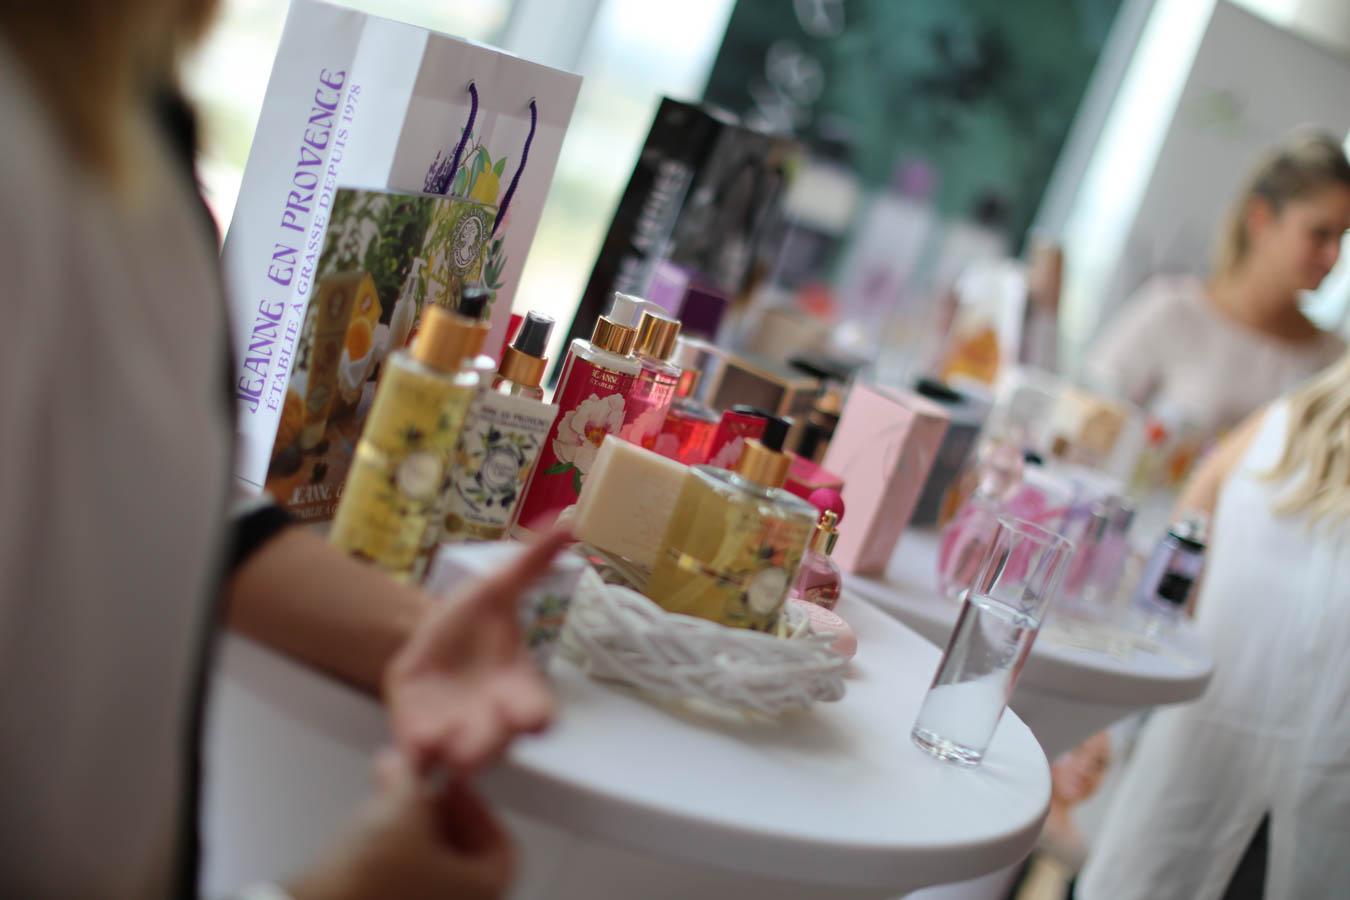 Beautypress Event: Jeanne en Provence Ètablie À Grasse